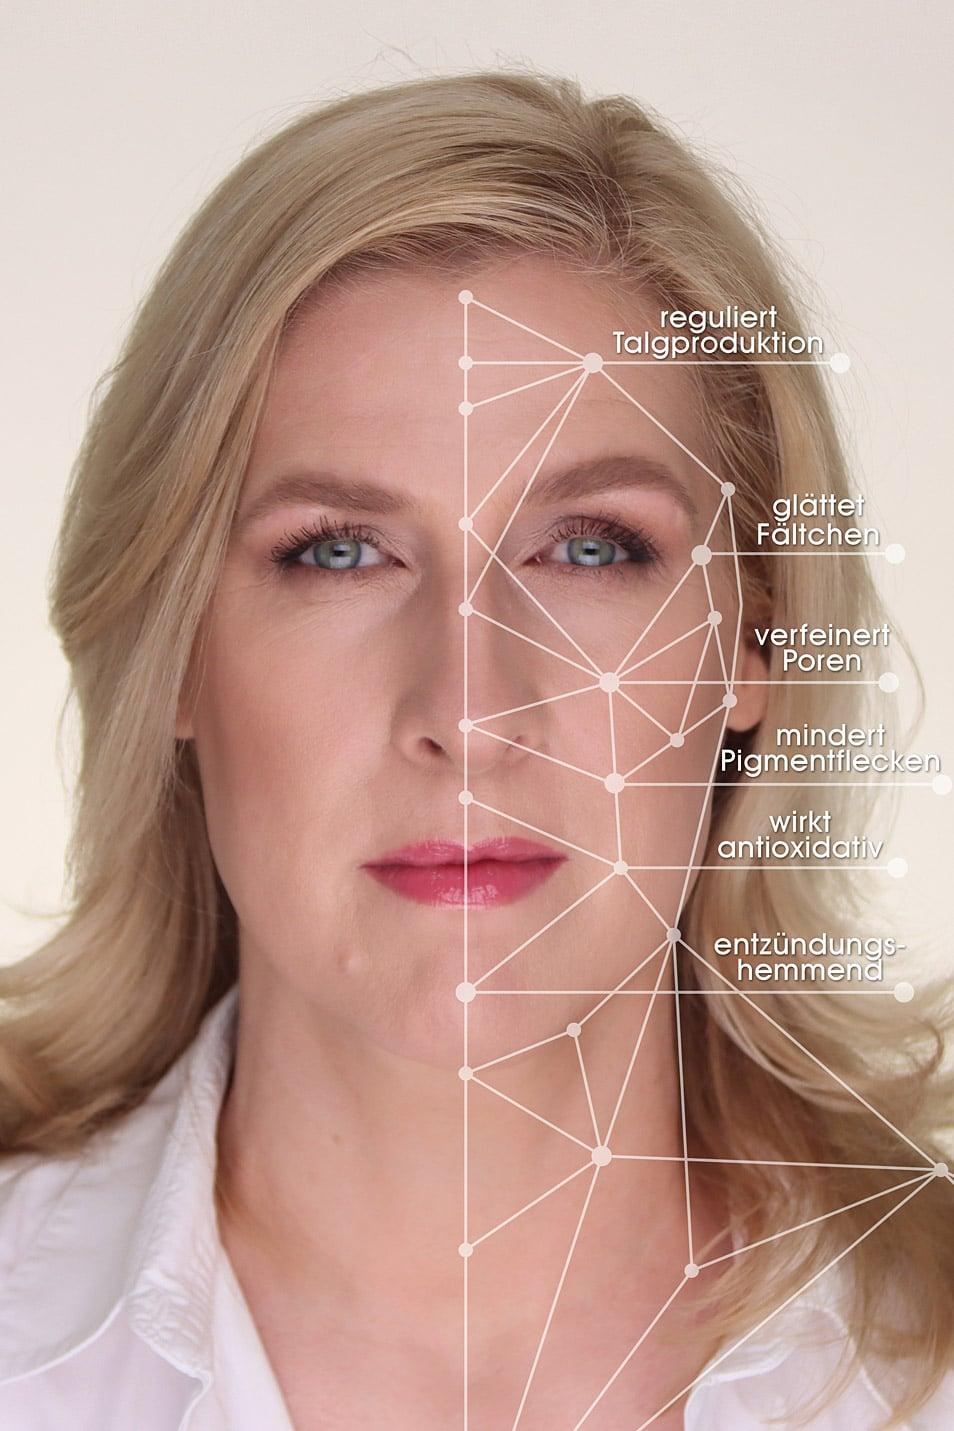 Anti Aging Wirkstoff Niacinamide Relana Dombetzki ALDO Magazin